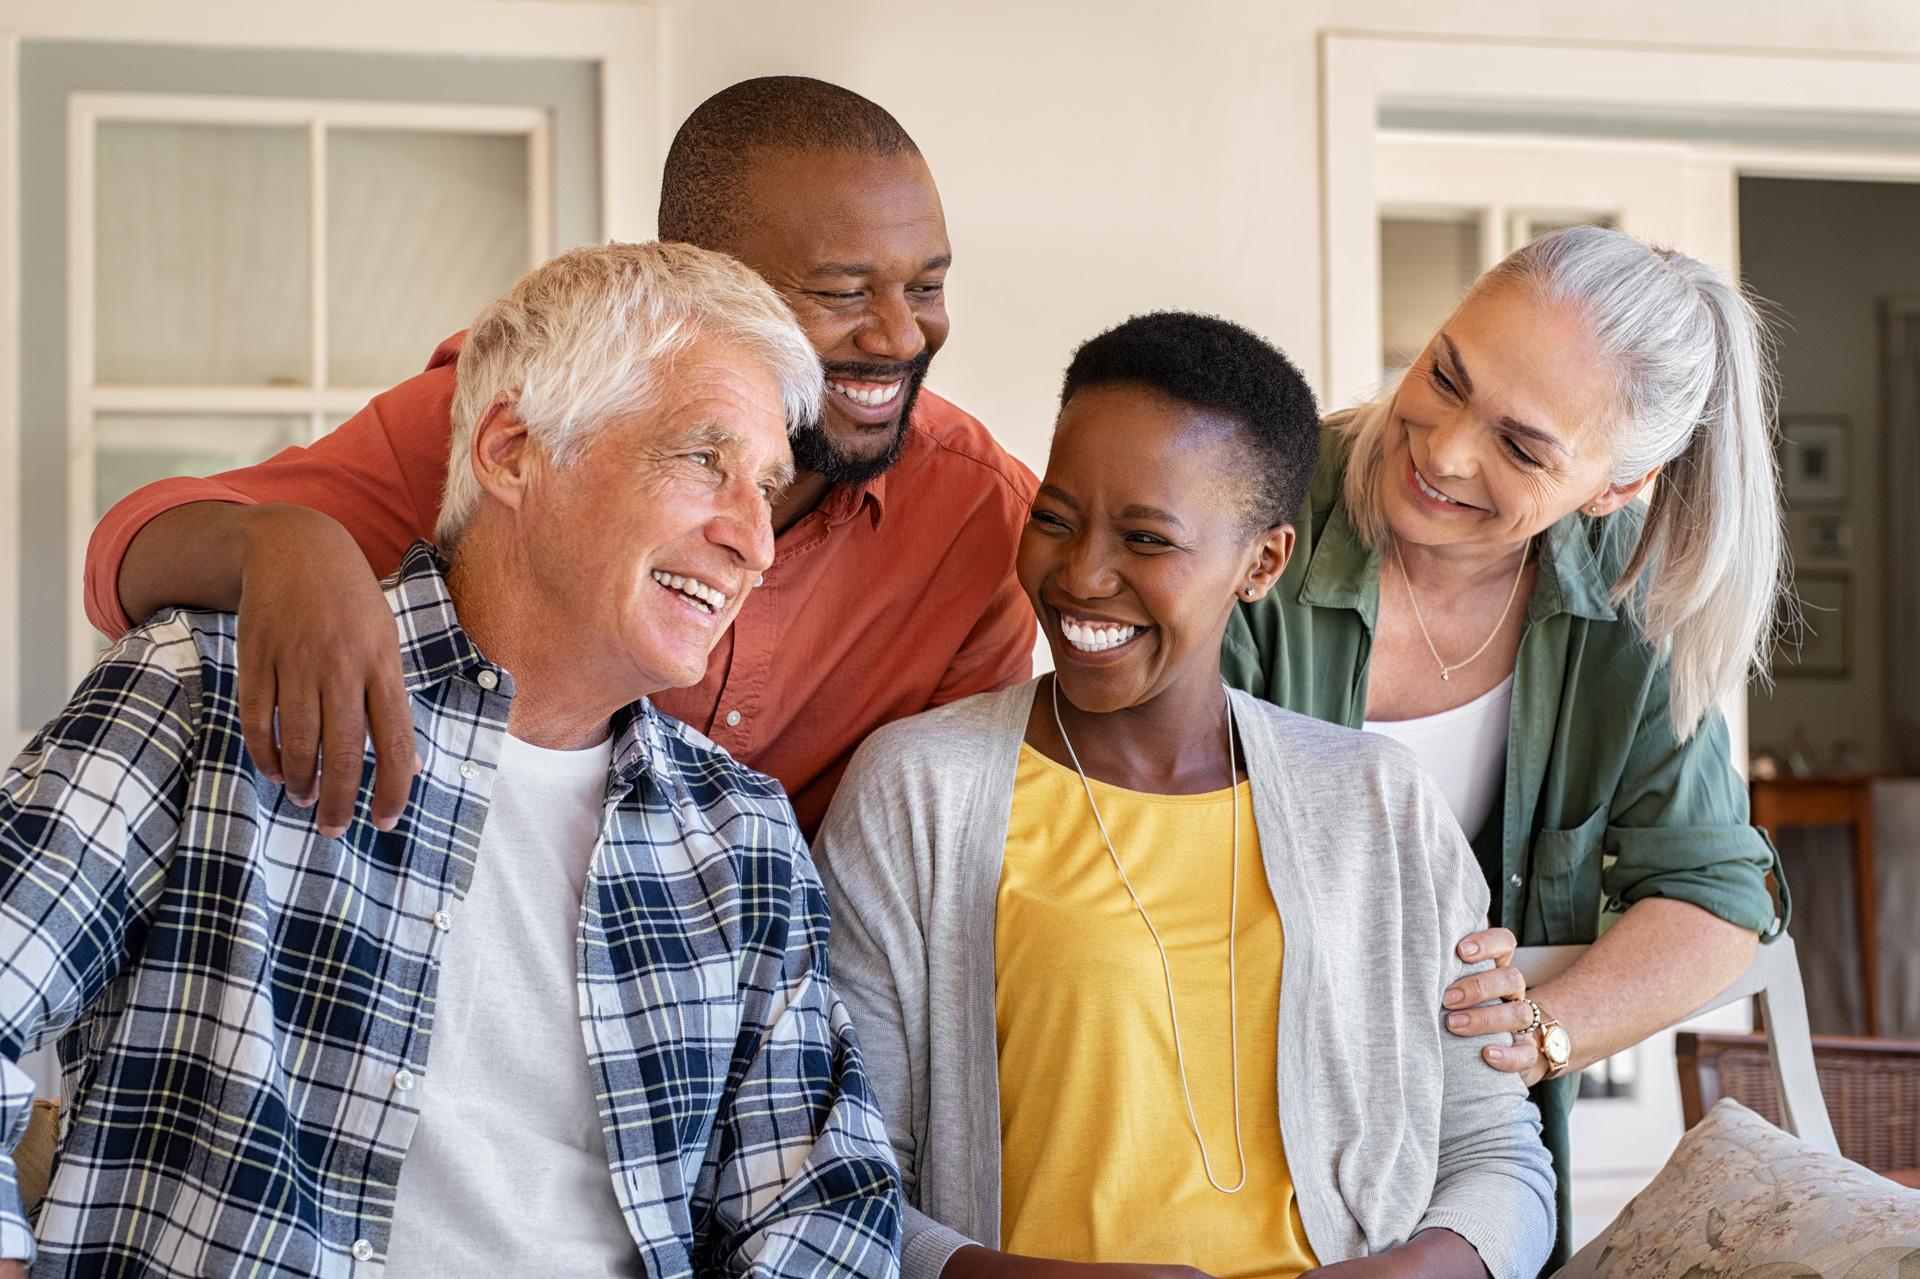 laughing-senior-friends-with-happy-women-L8BASQR-1.jpg